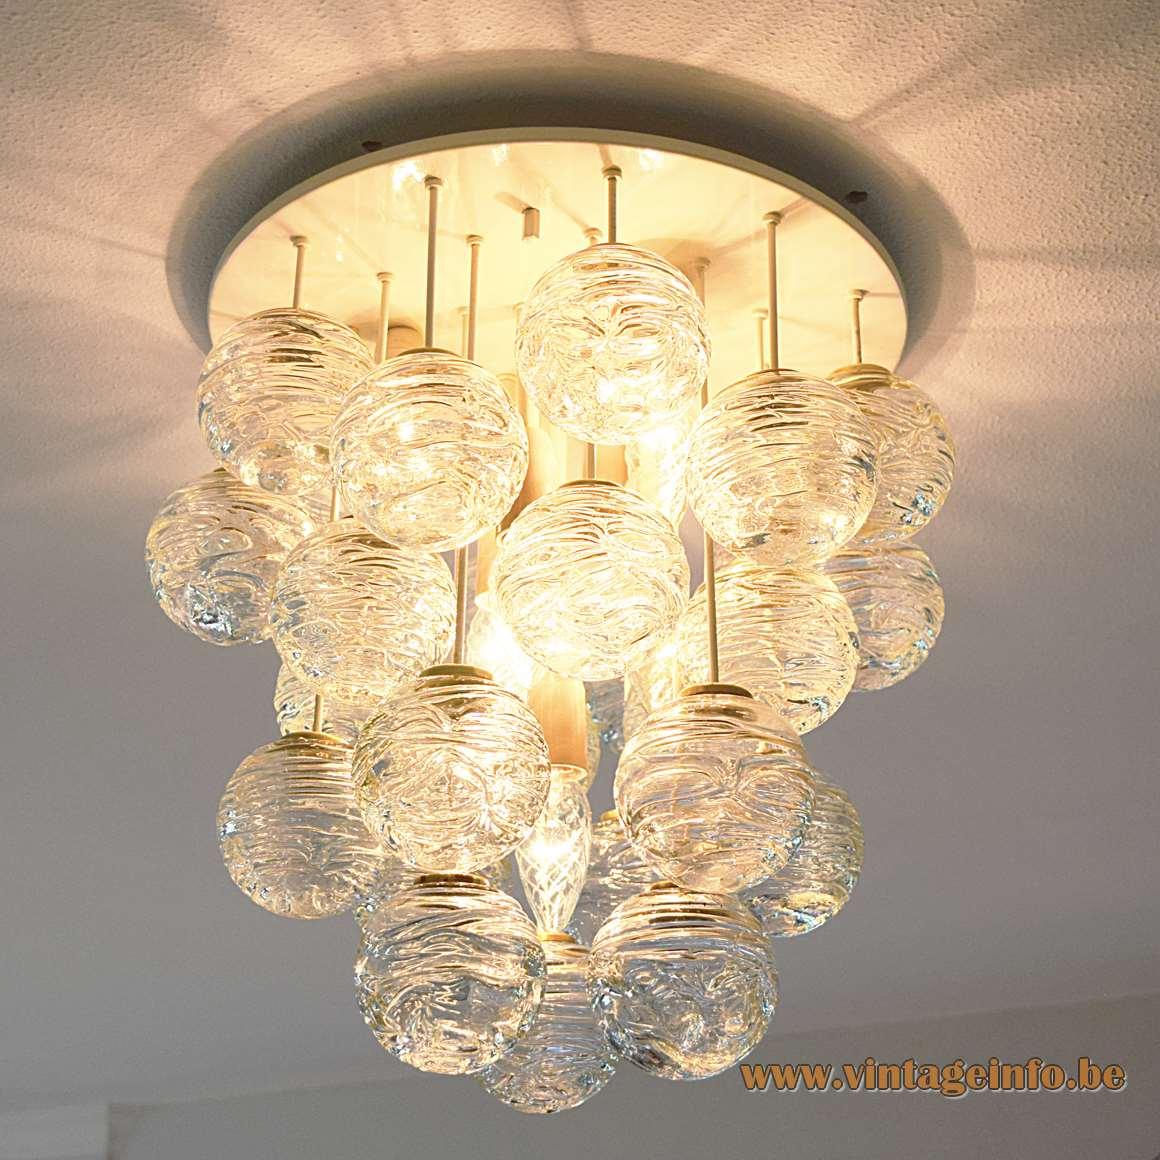 Doria Snowball Flush Mount 27 swirled glass globes balls brass round ceiling mount 1960s 1970s MCM